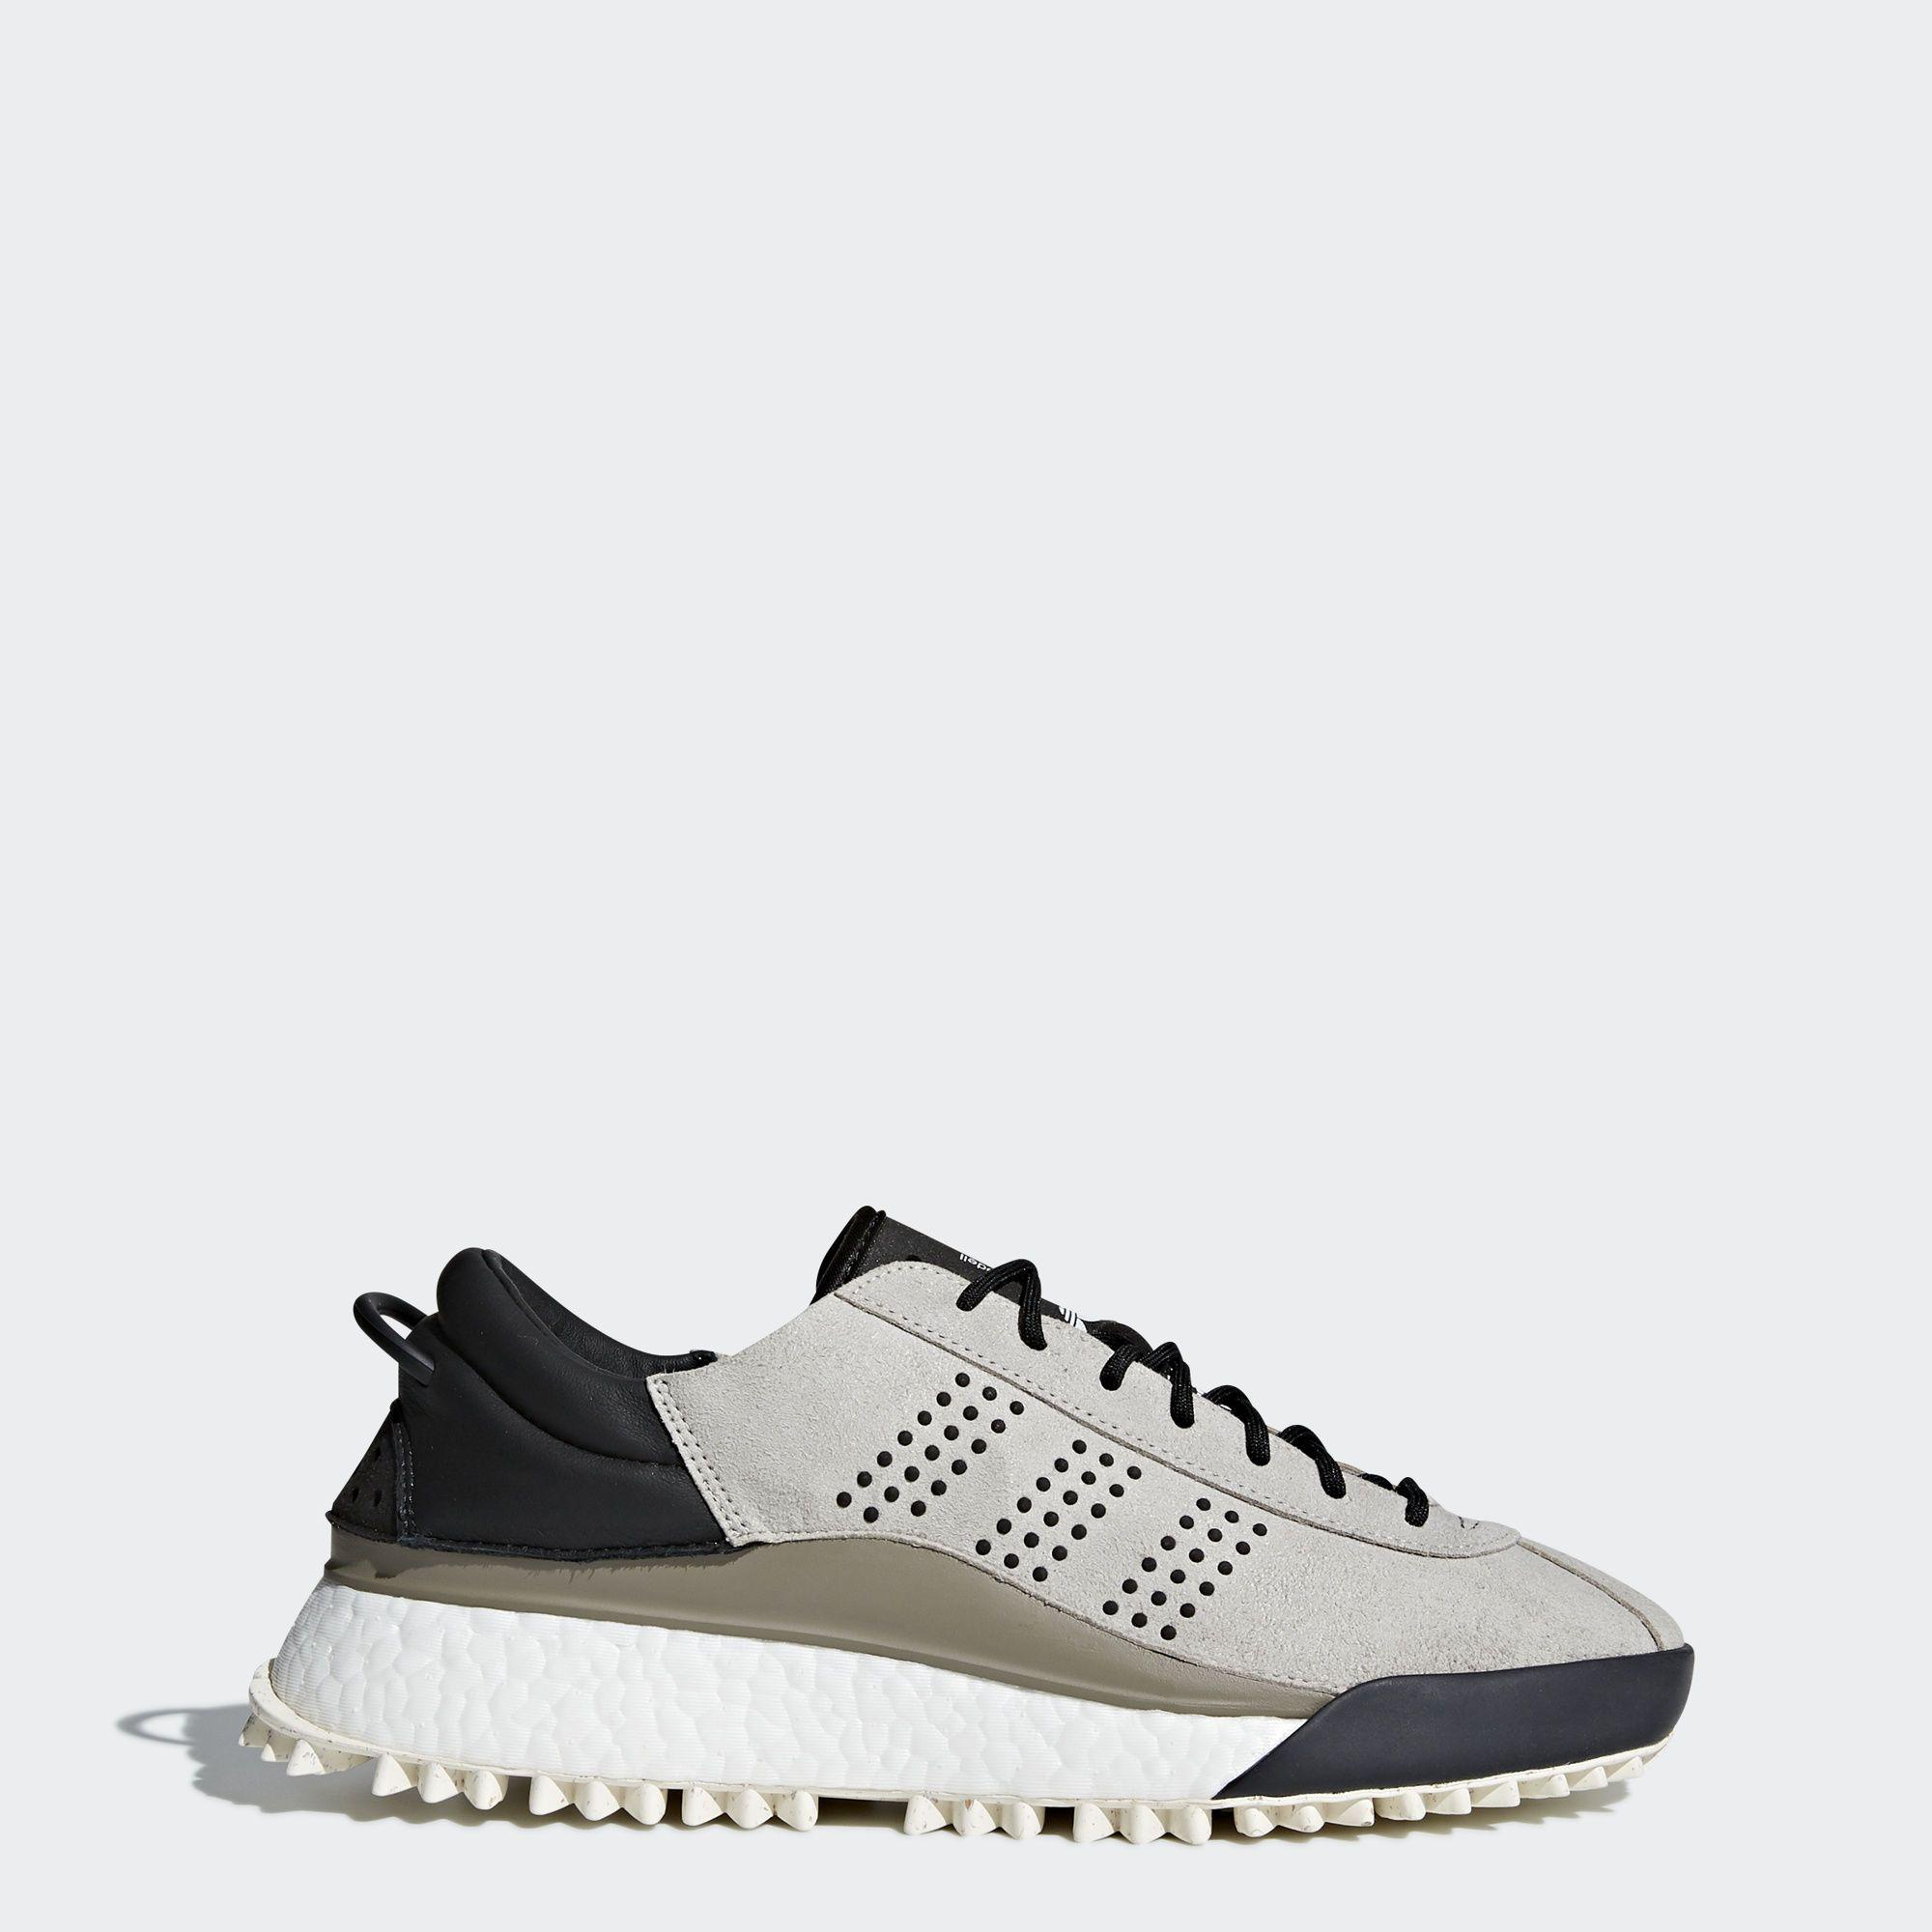 L'esclusiva collezione adidas Originals by Alexander Wang